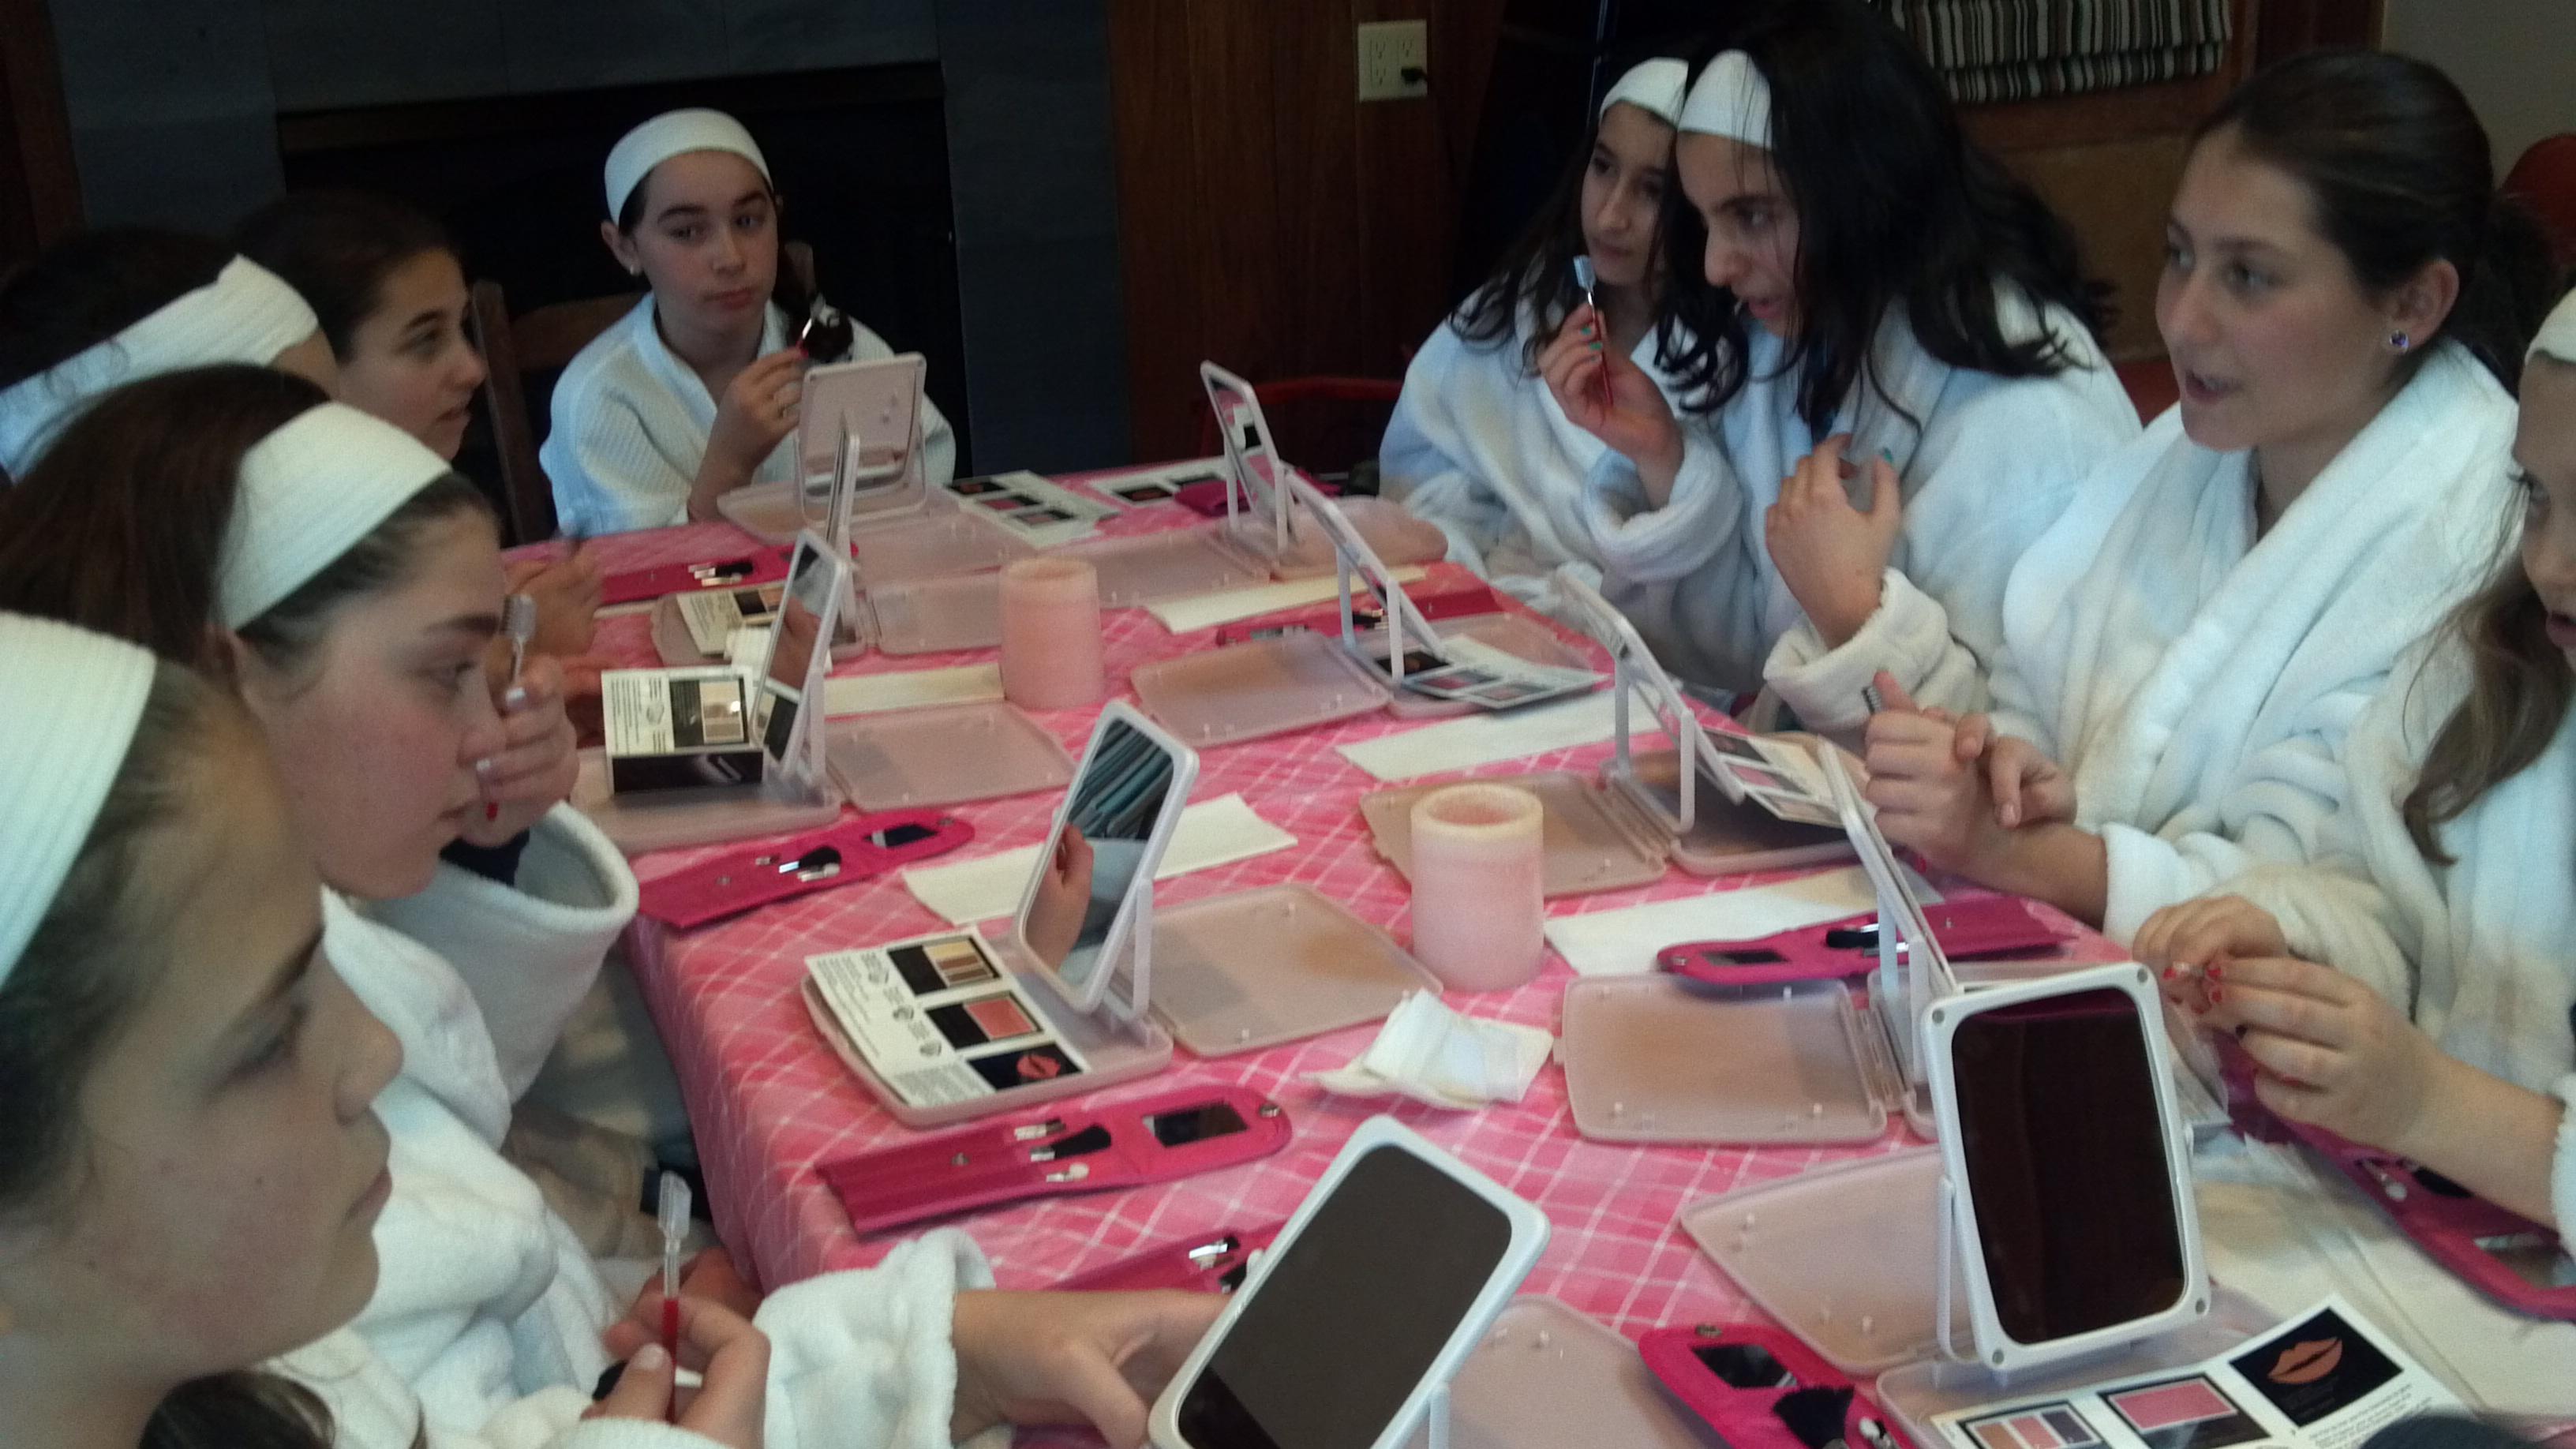 Girl  Teens Spa Parties  Spa Party Sisters We Bring